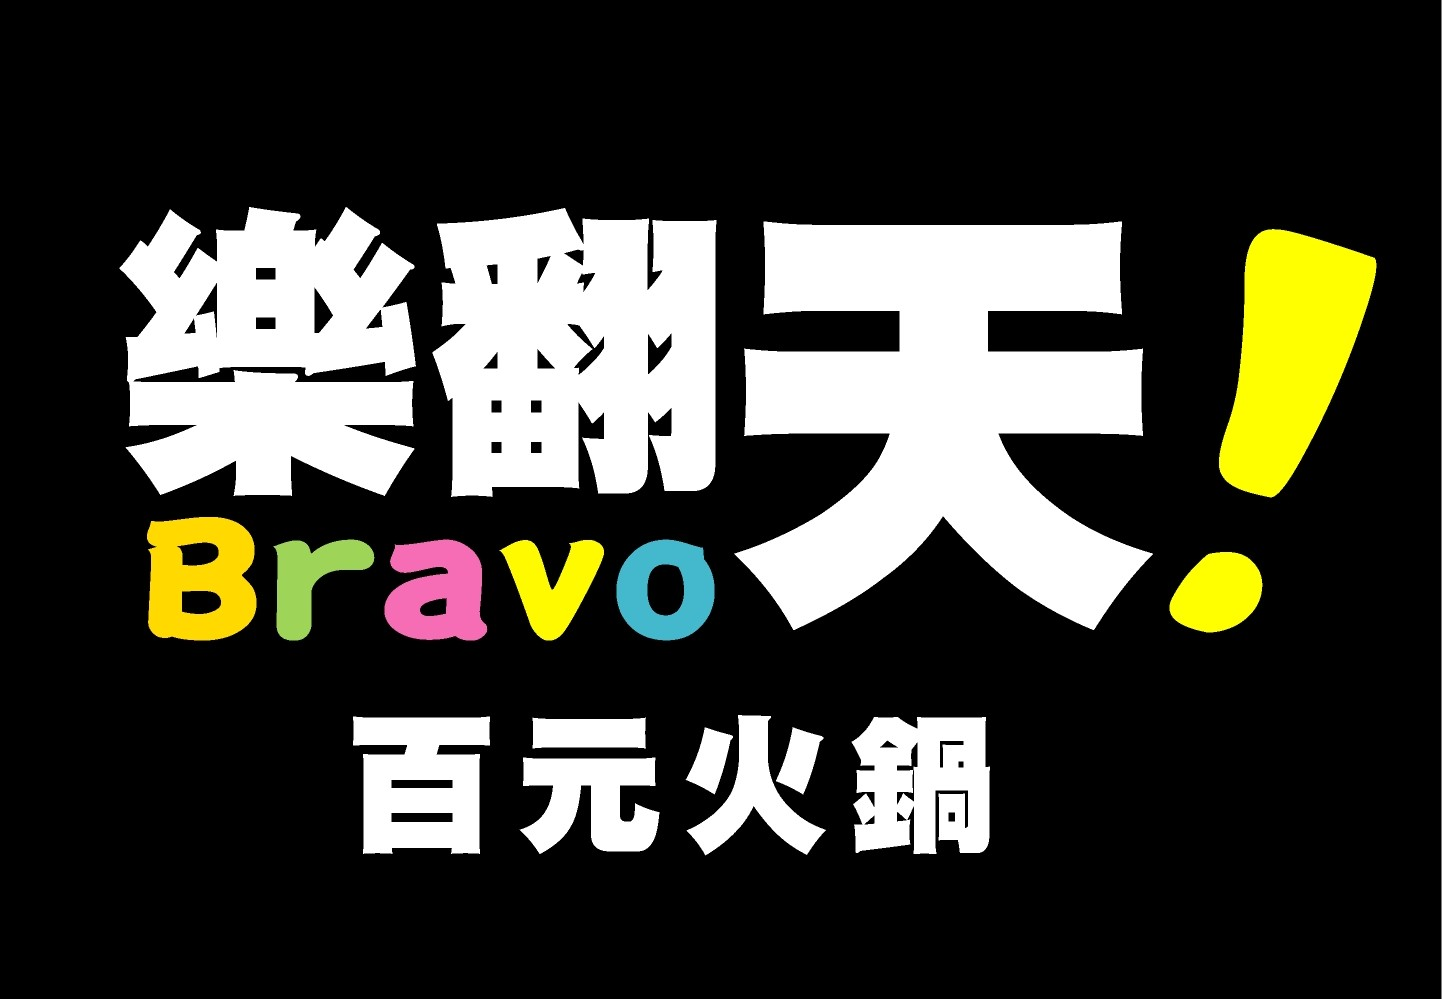 Bravo 樂翻天-百元火鍋